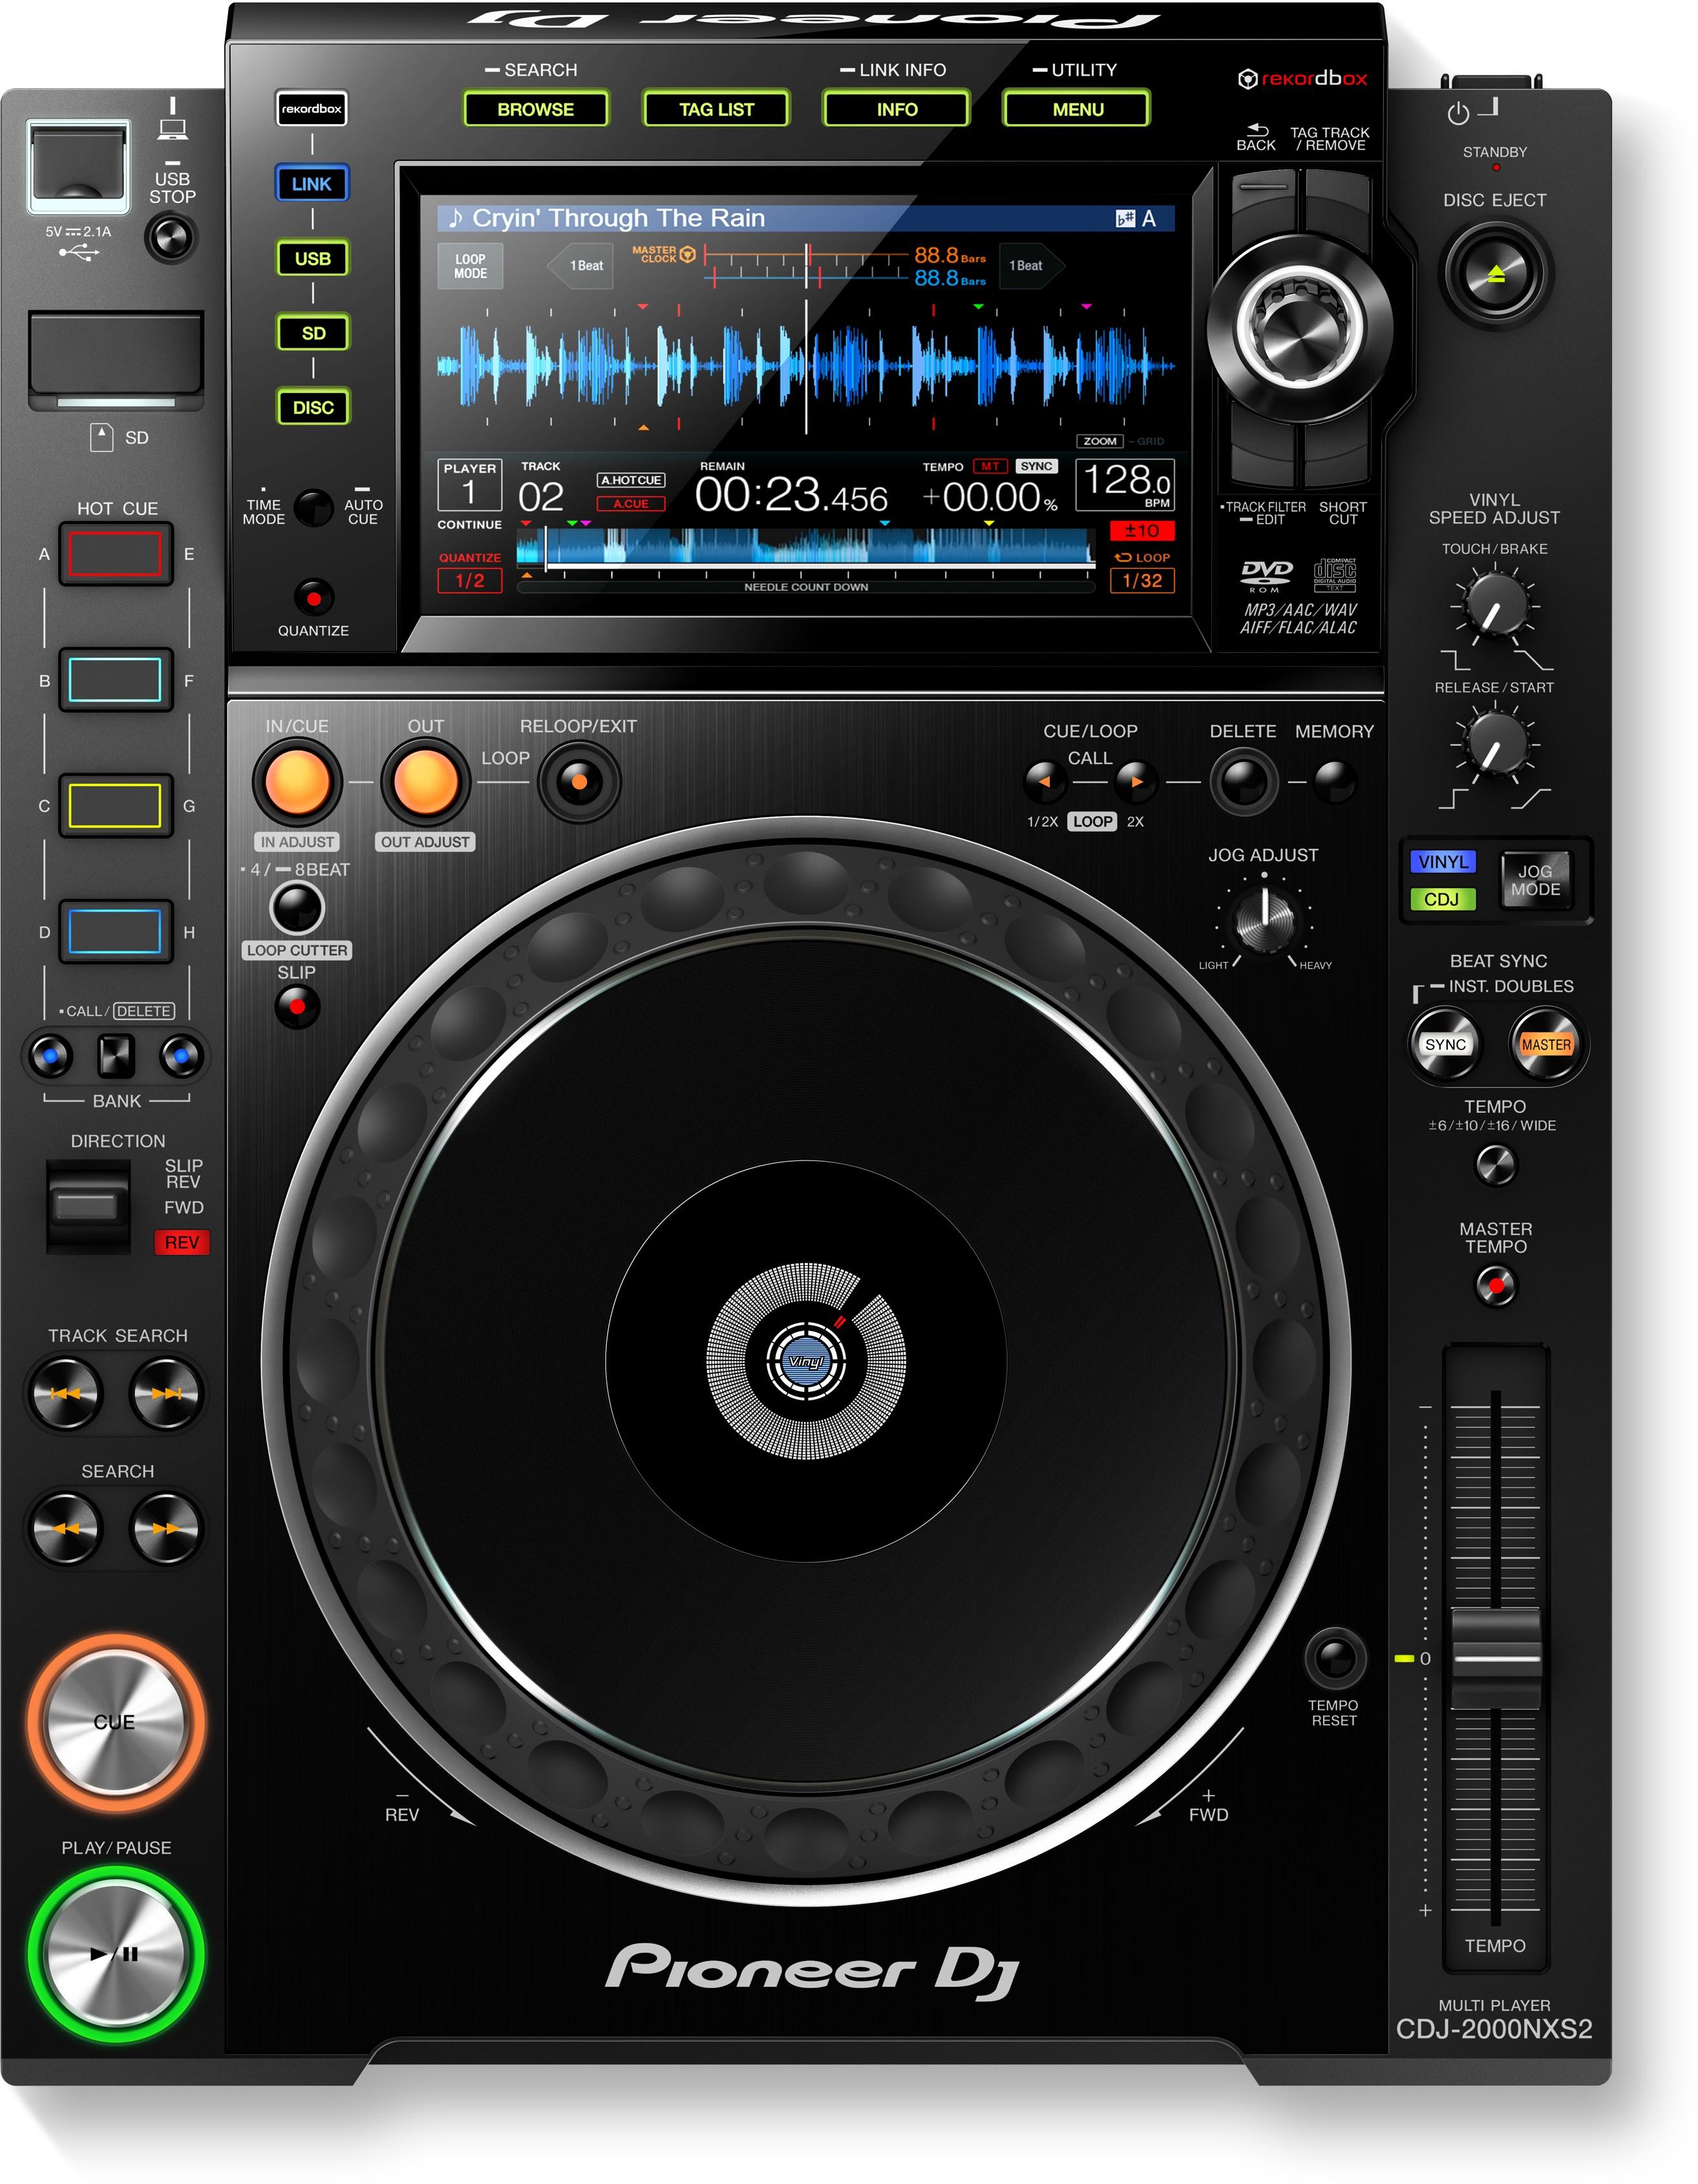 CD-/USB-/Cassette players